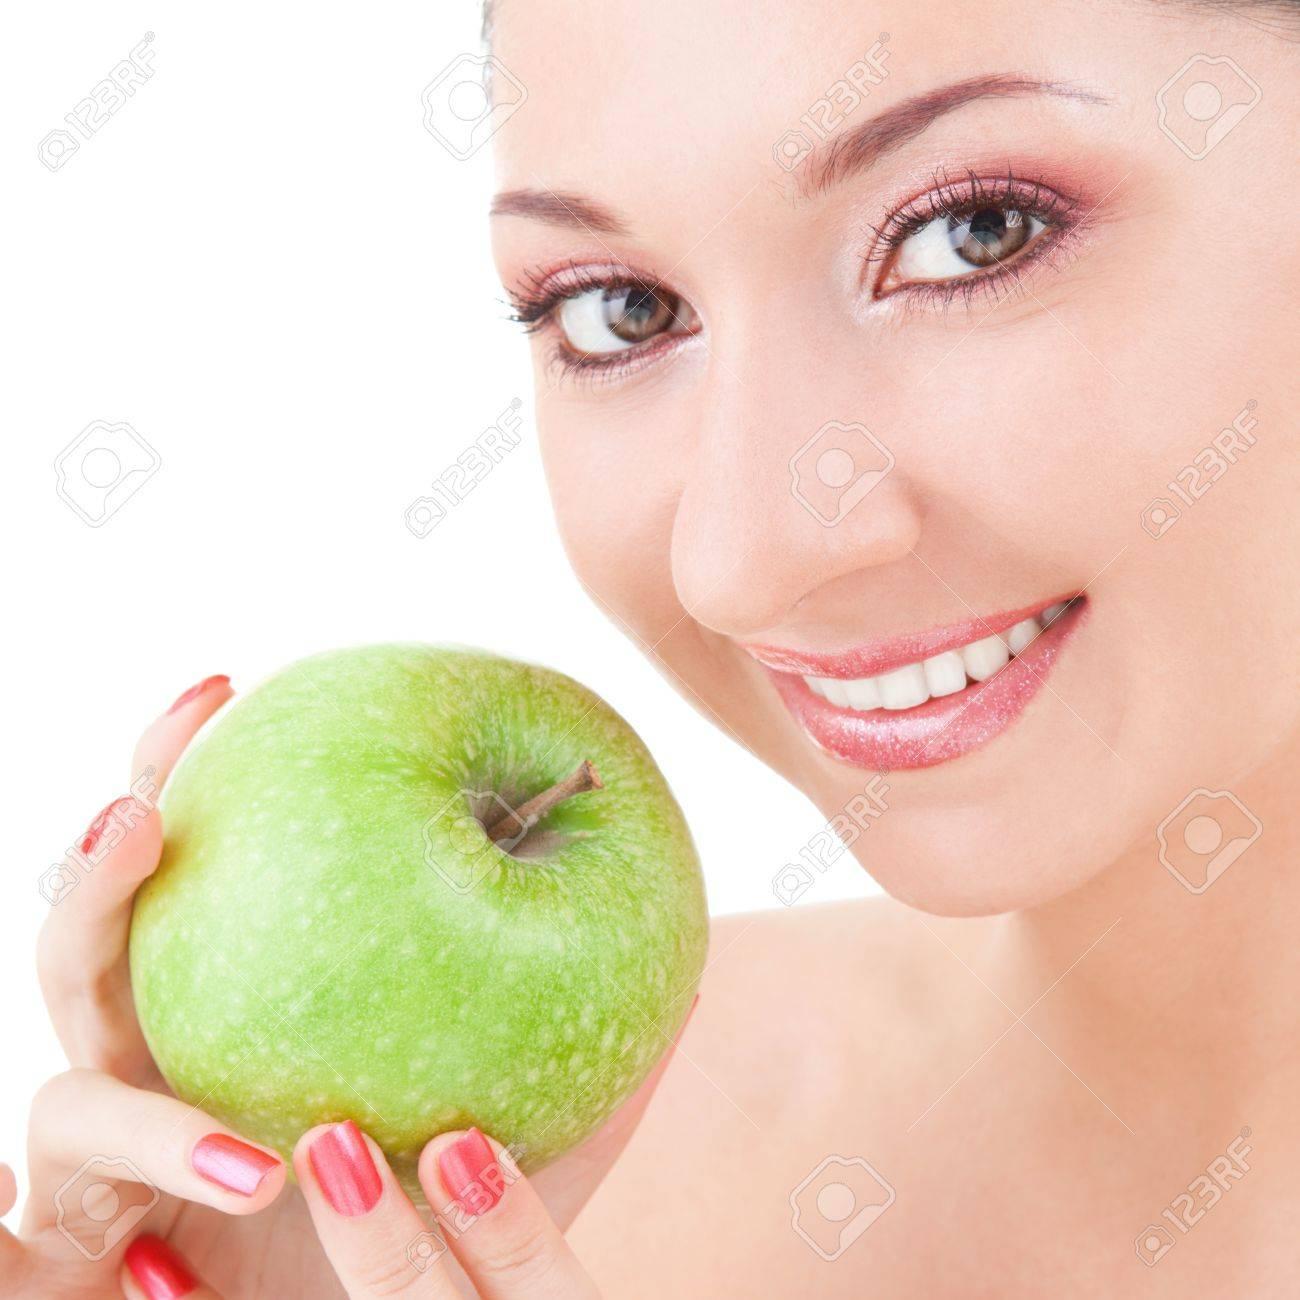 sweet girl eating green apple on white background Stock Photo - 7521007